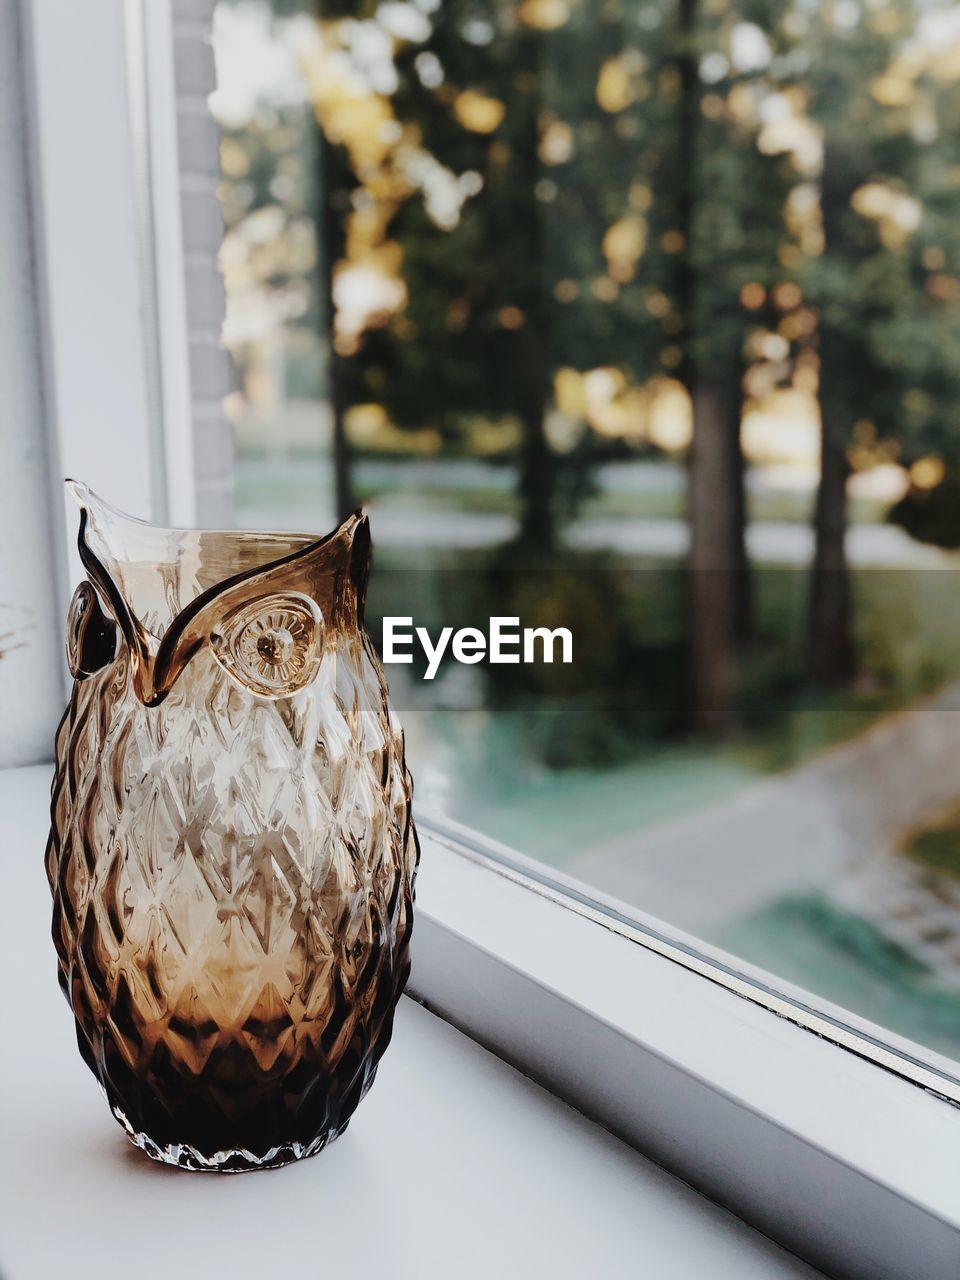 CLOSE-UP OF A BIRD ON WINDOW